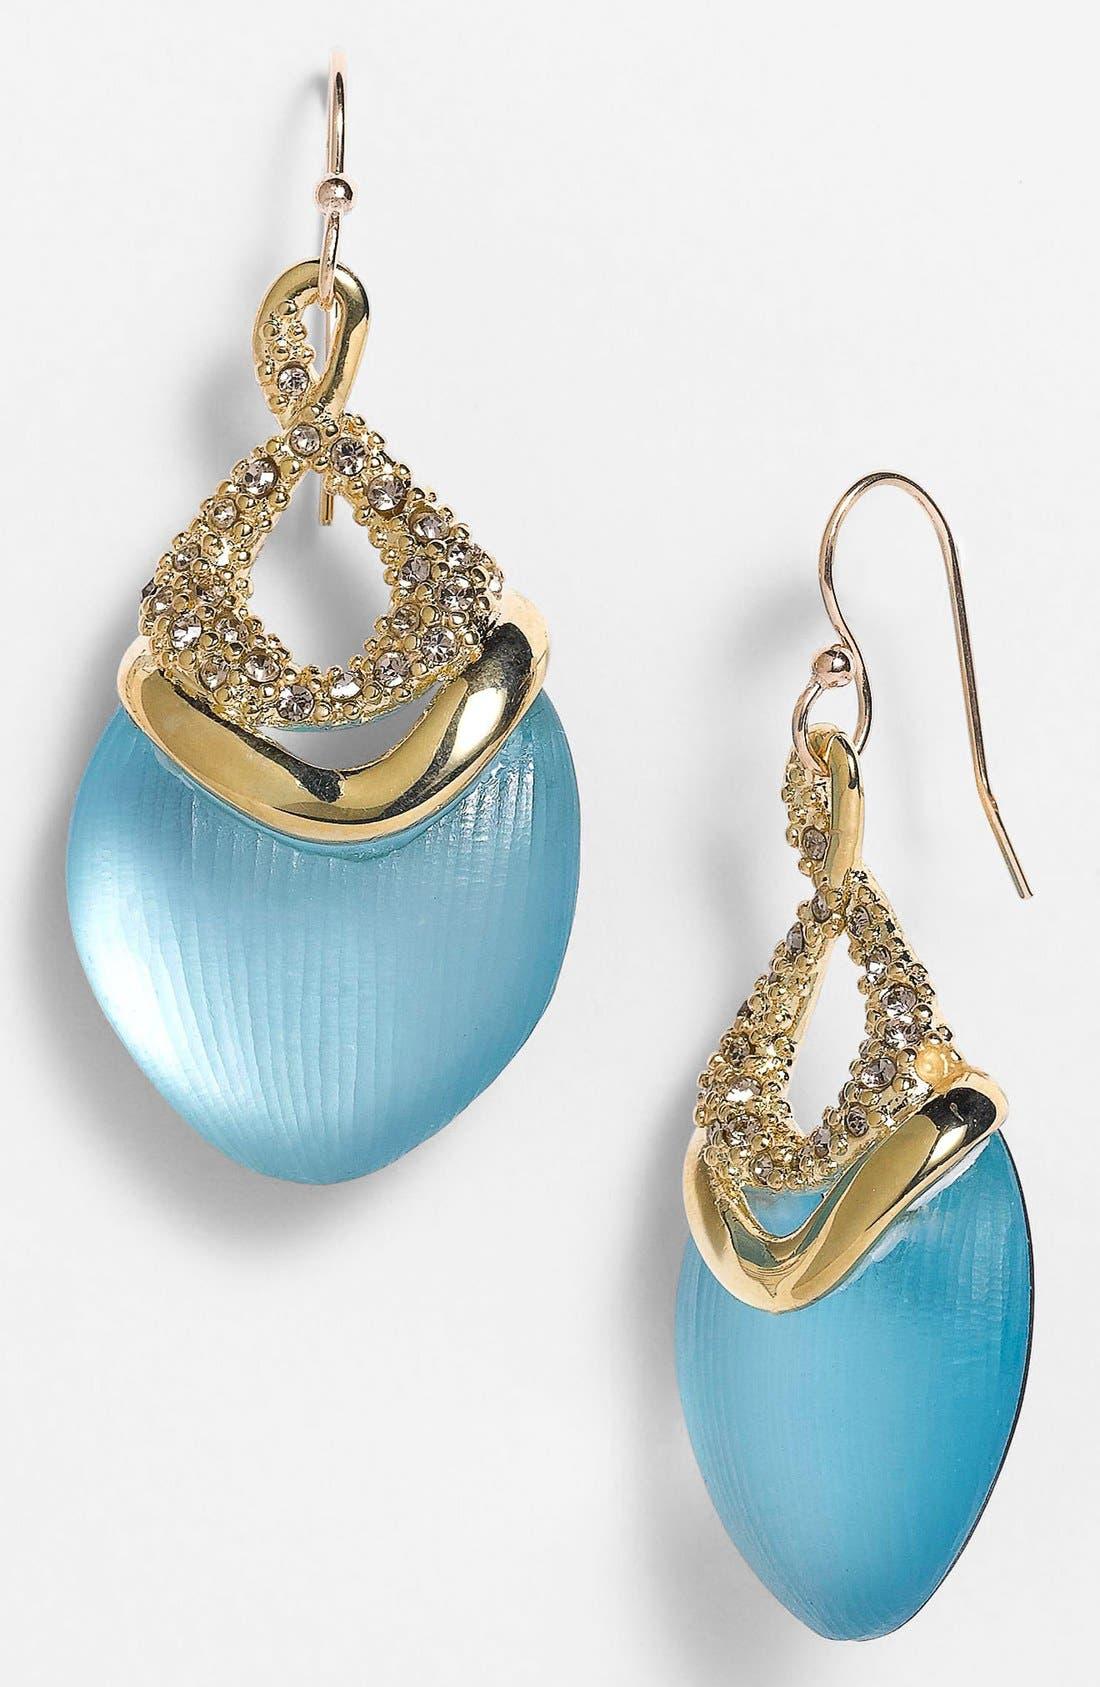 Main Image - Alexis Bittar 'Lucite® - Mod' Drop Earrings